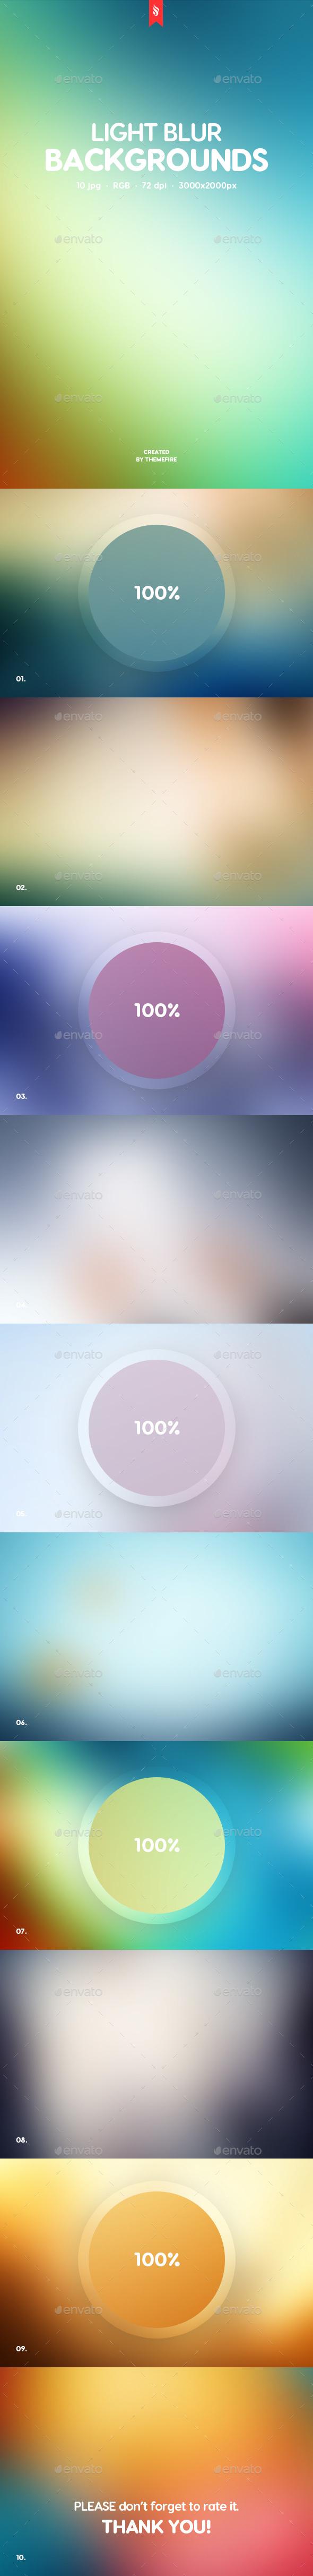 Light Blur Backgrounds - Backgrounds Graphics